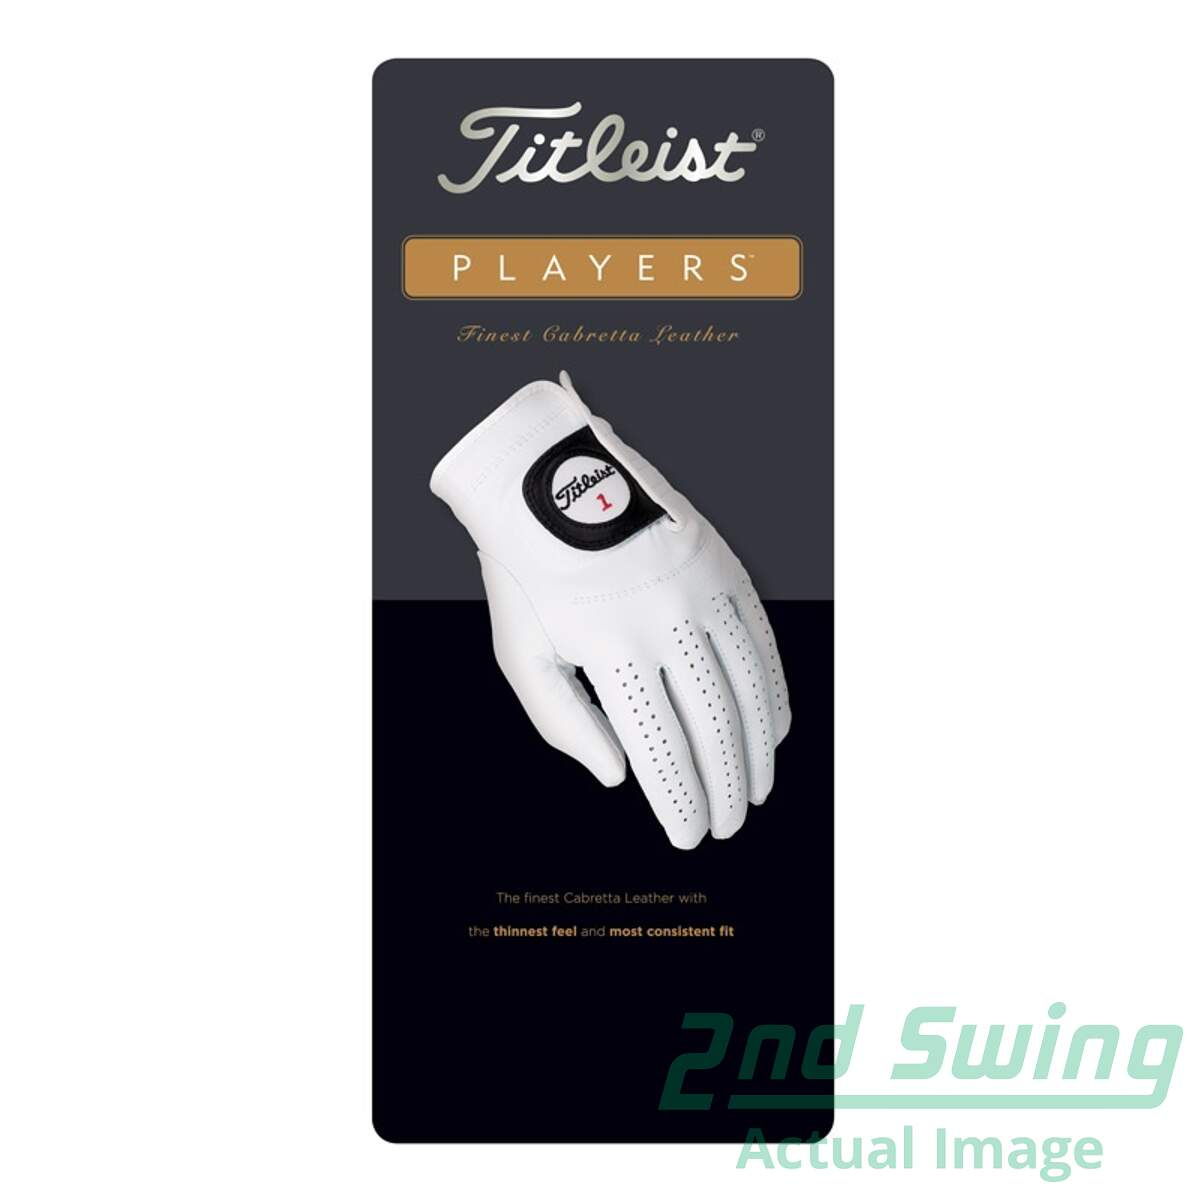 Mens golf gloves xxl - New Mens Titleist Players Golf Glove Xx Large Xxl Leather Left Handed